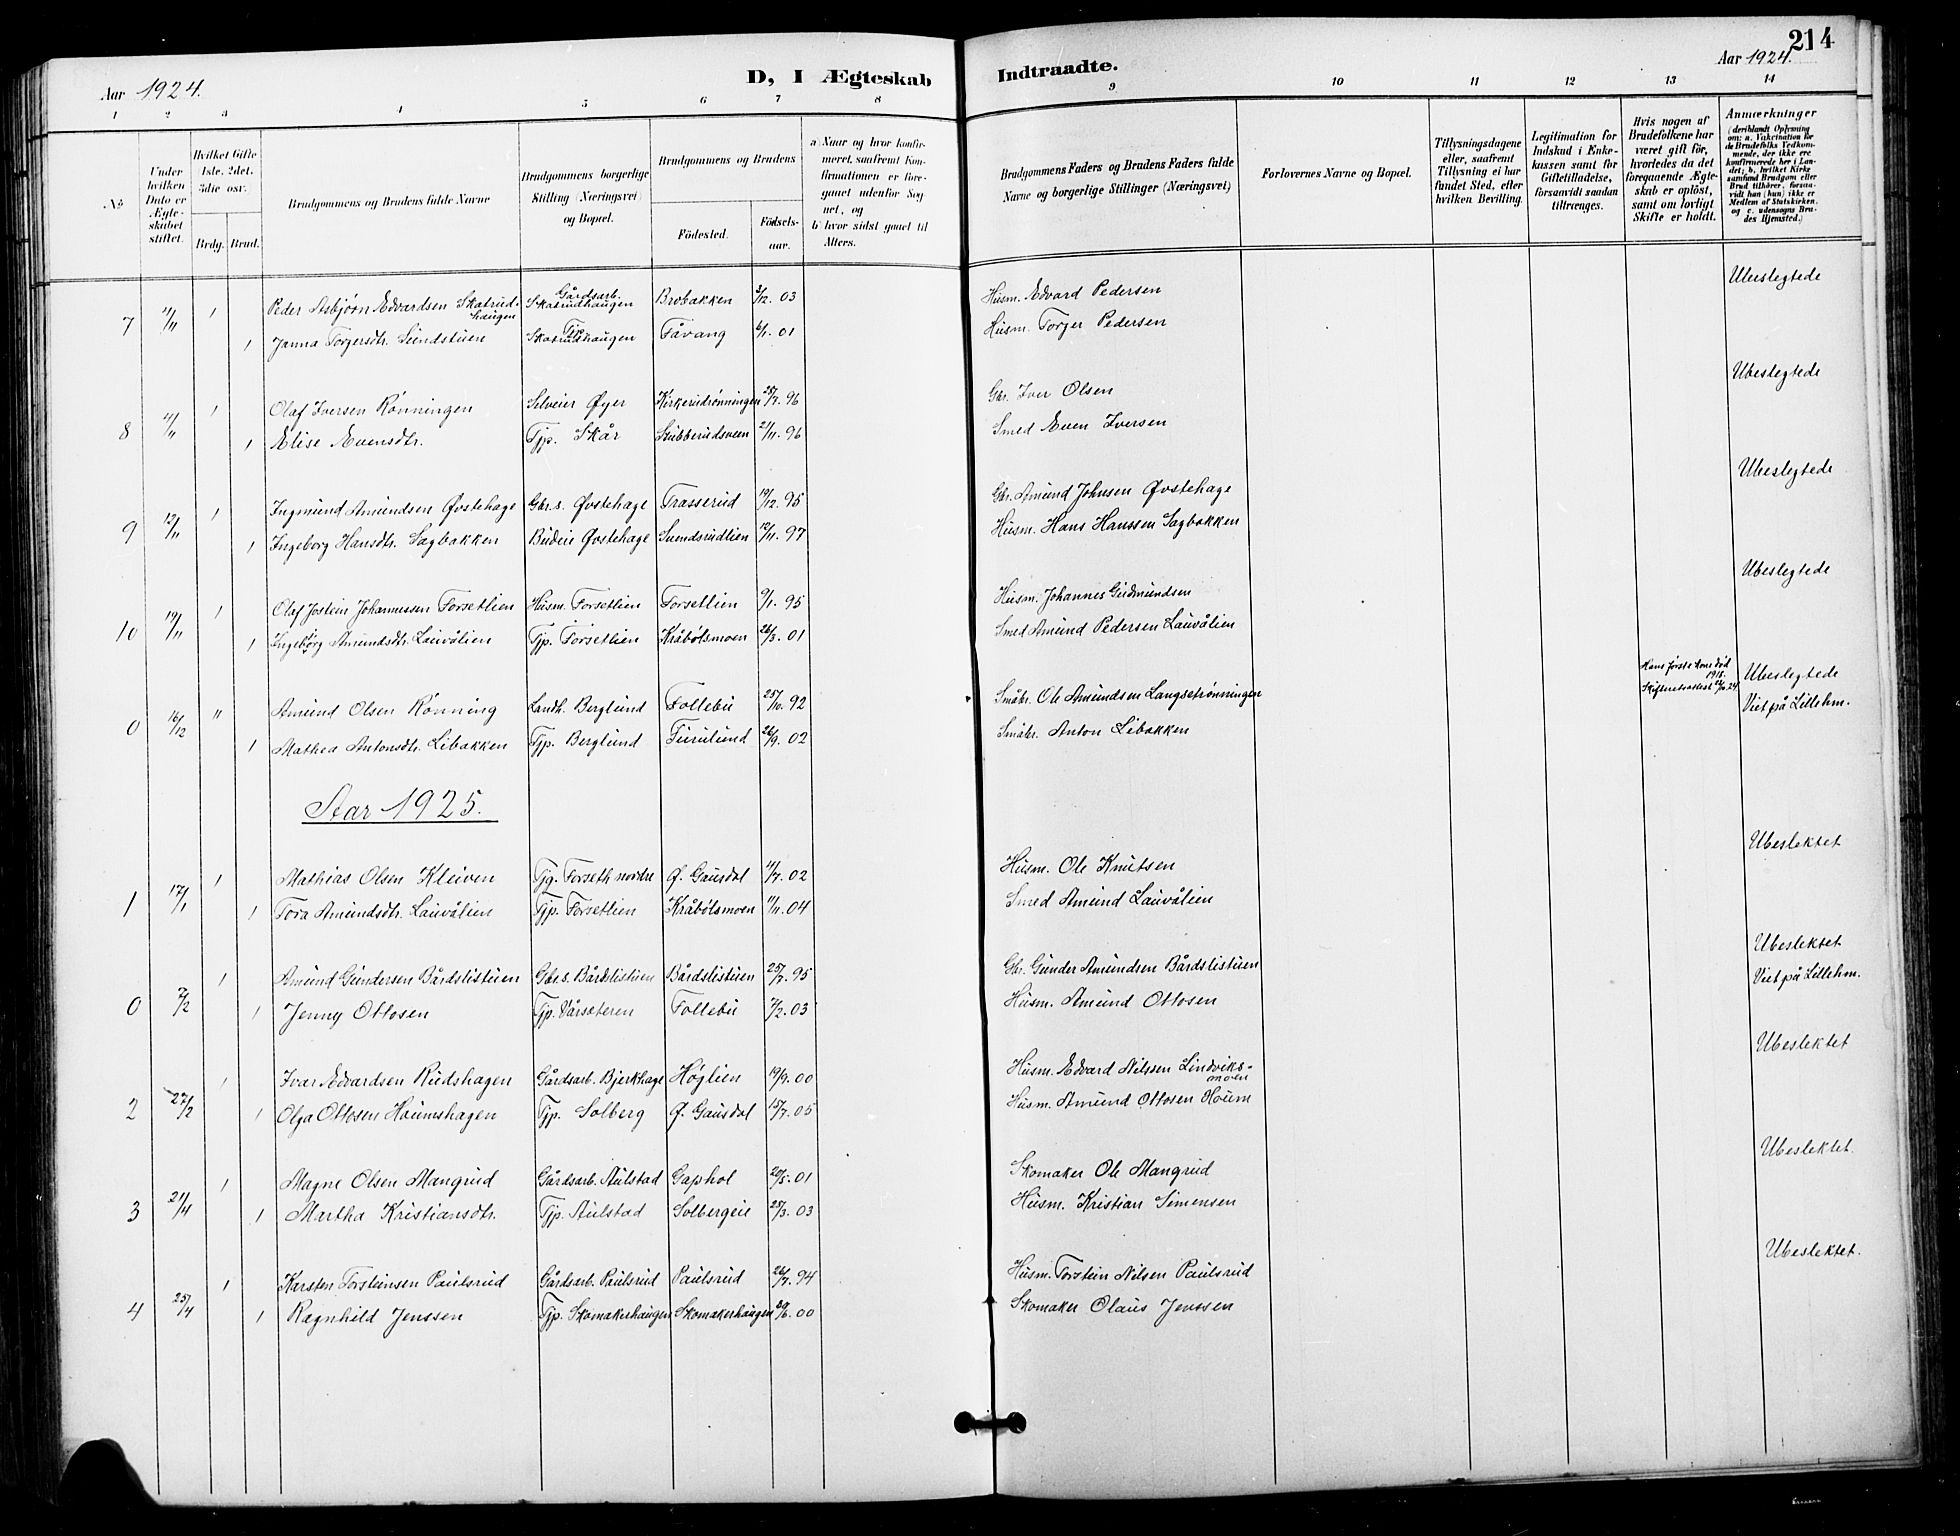 SAH, Vestre Gausdal prestekontor, Klokkerbok nr. 3, 1896-1925, s. 214